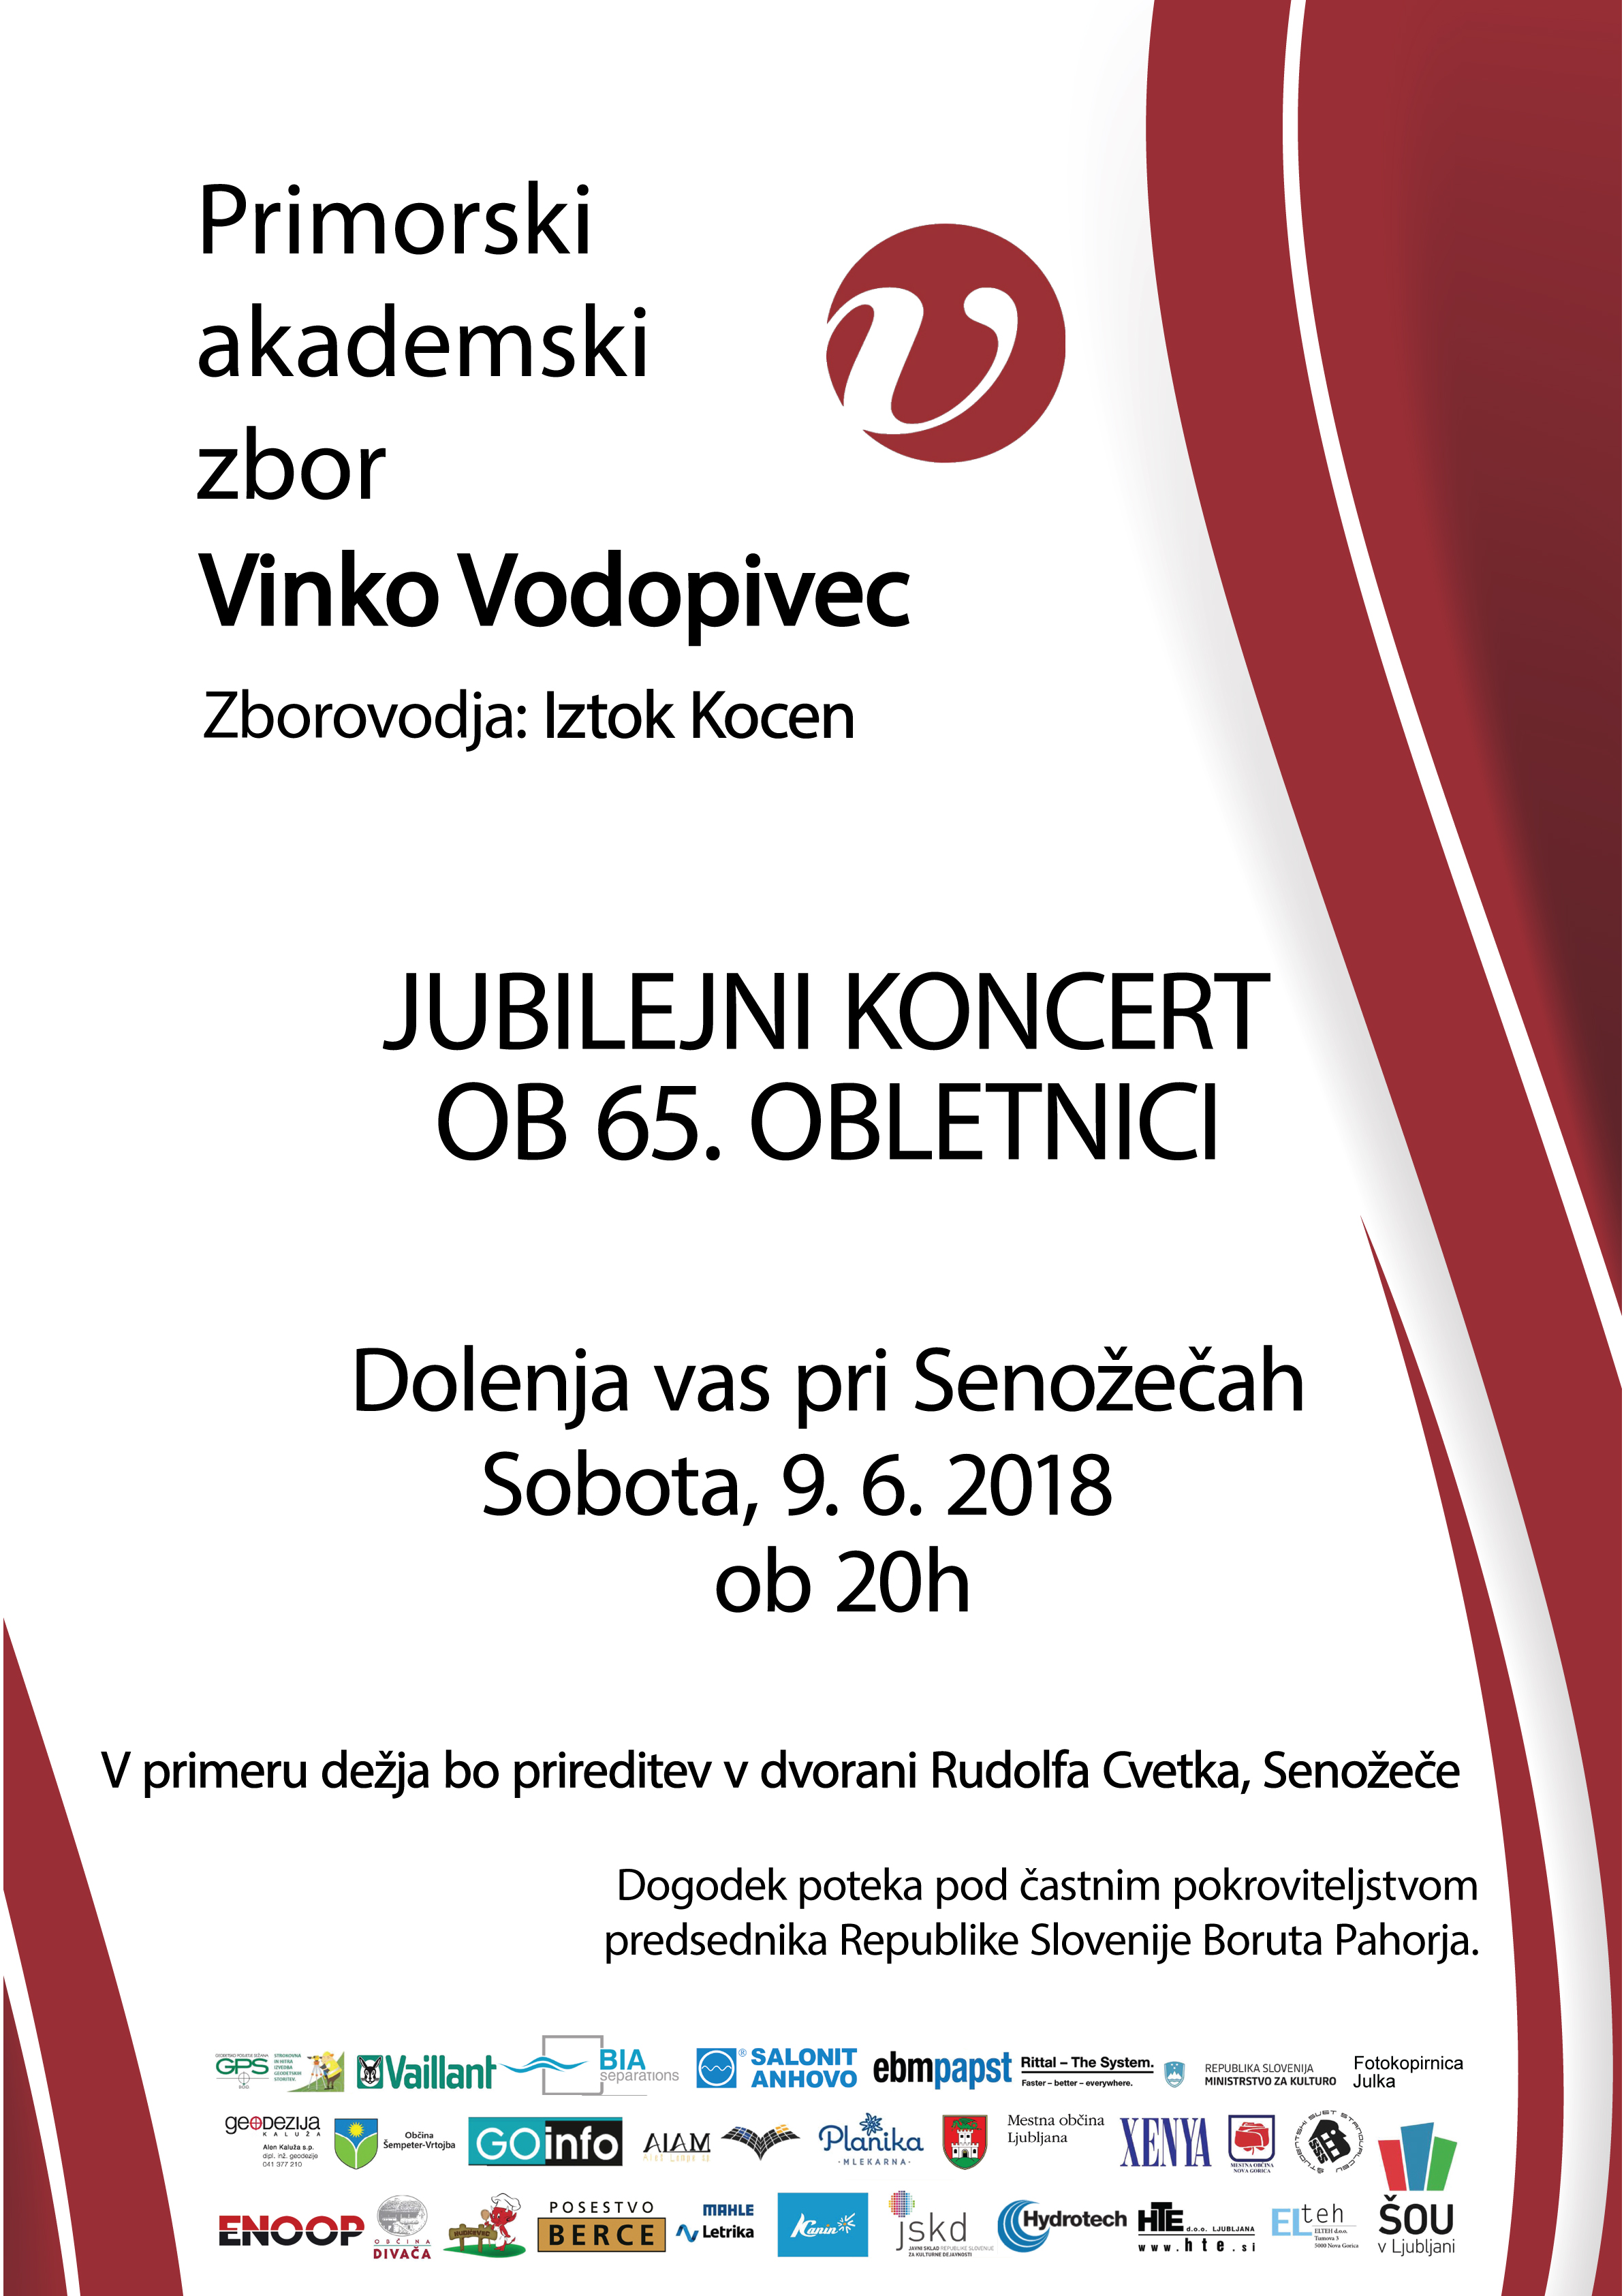 Jubilejni koncert @ Dolenja vas pri Senožečah